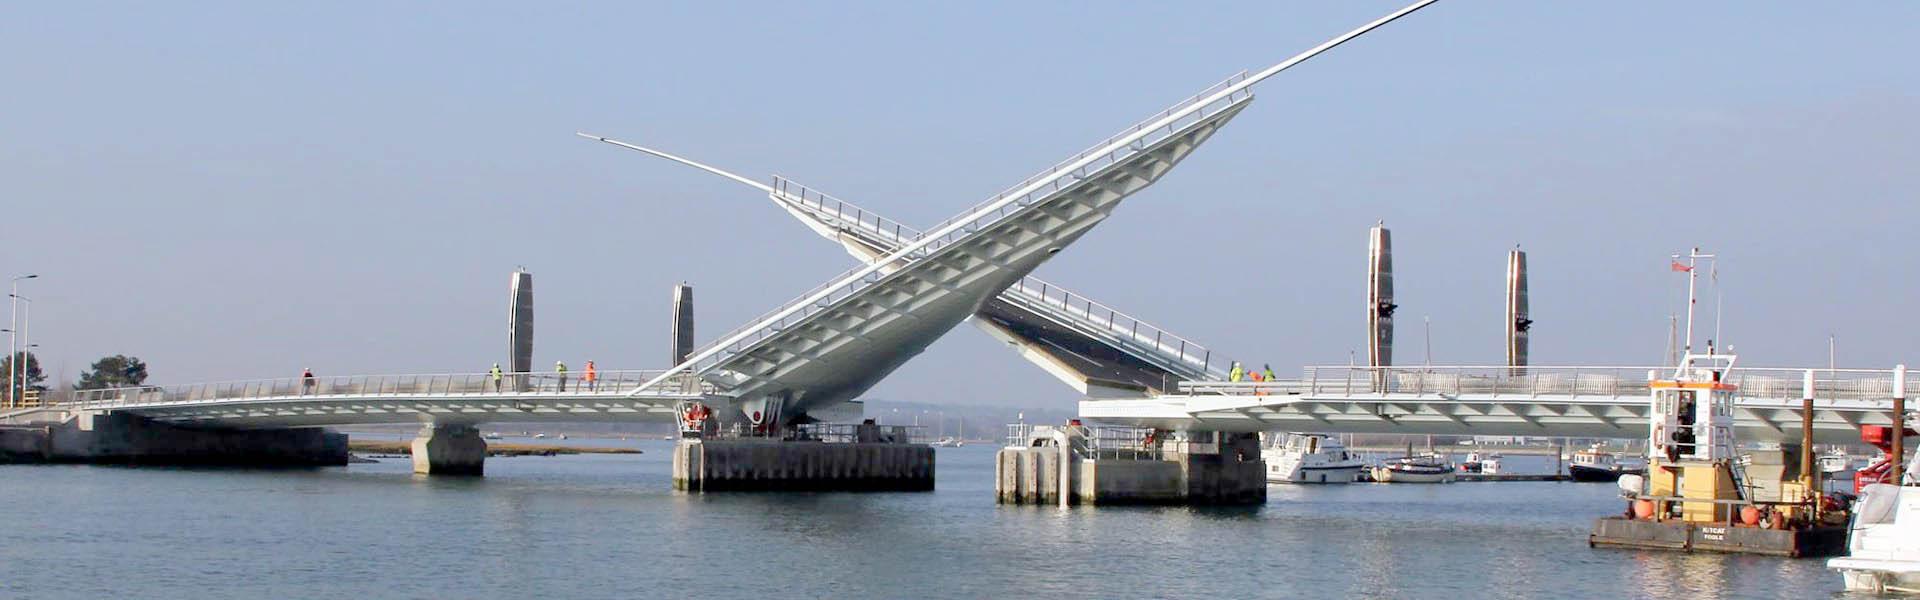 twin-sails-slider-3